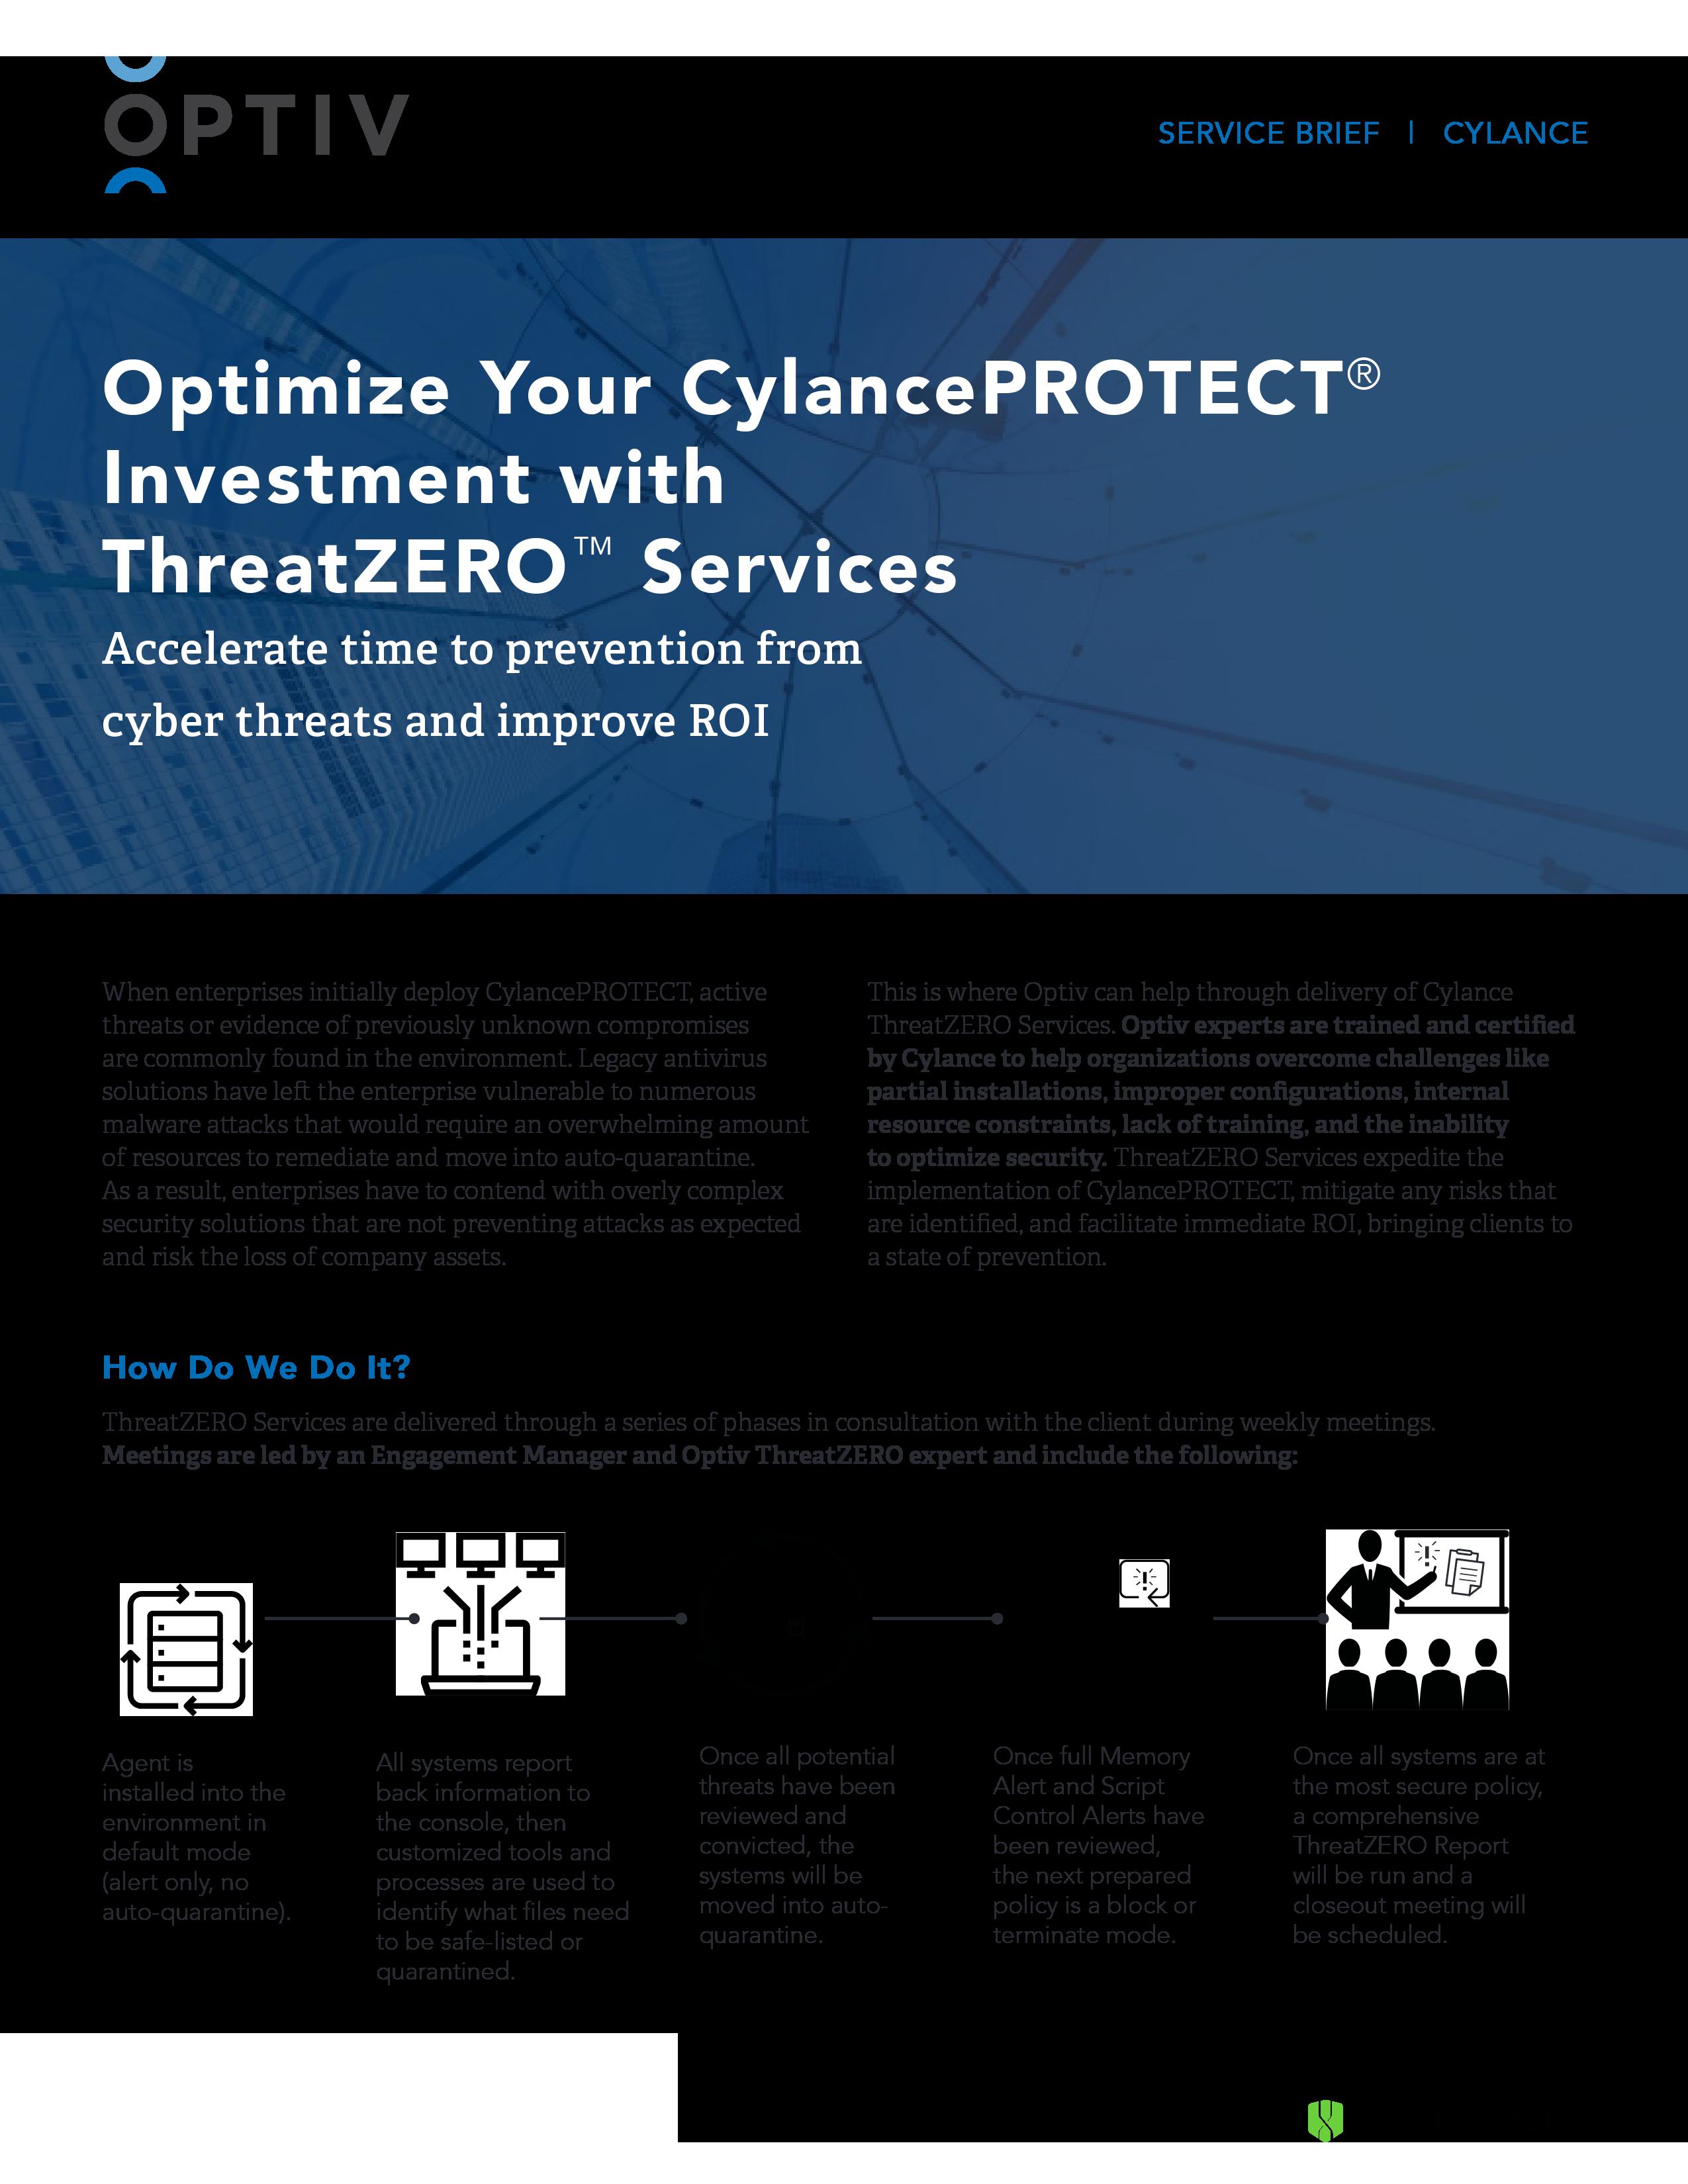 Cylance ThreatZERO Services